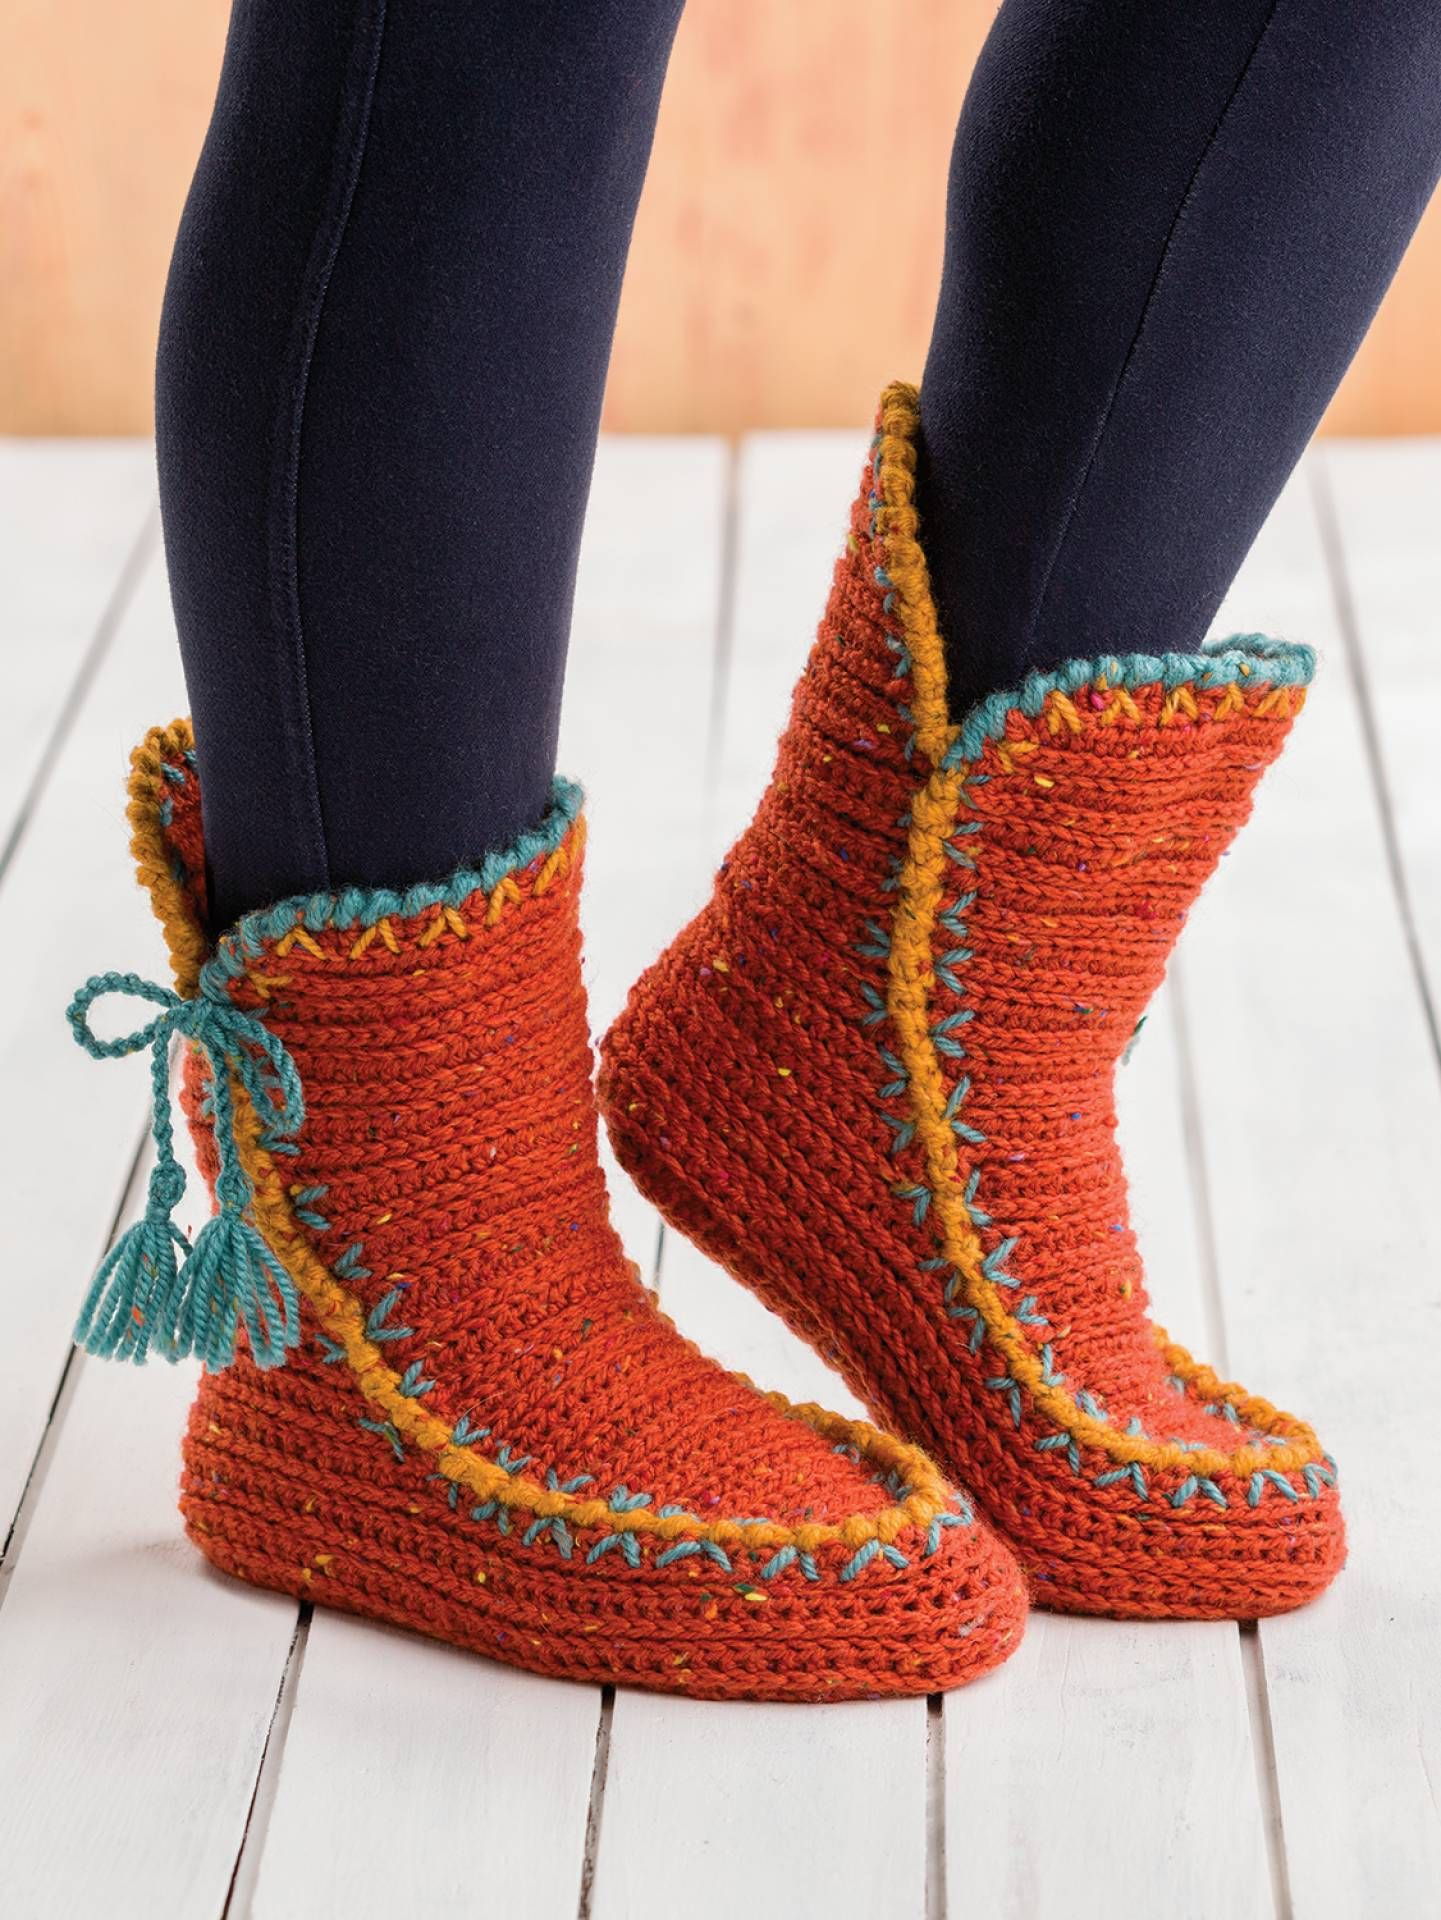 Save 50% on Annie's Signature Designs Crochet Downloads ...